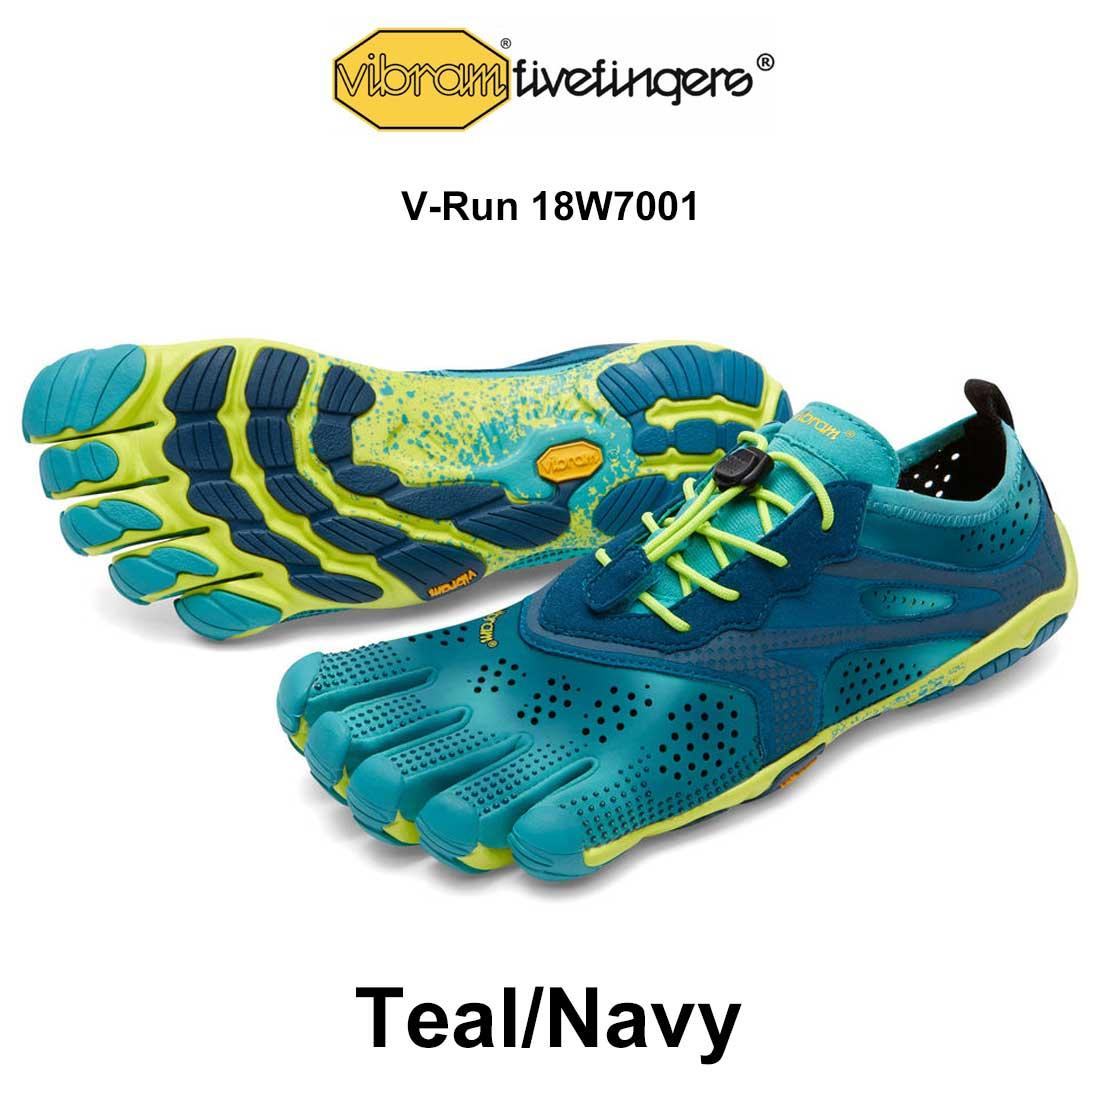 Vibram FiveFingers(ビブラムファイブフィンガーズ)レディース 五本指 シューズ V-Run 18W7001